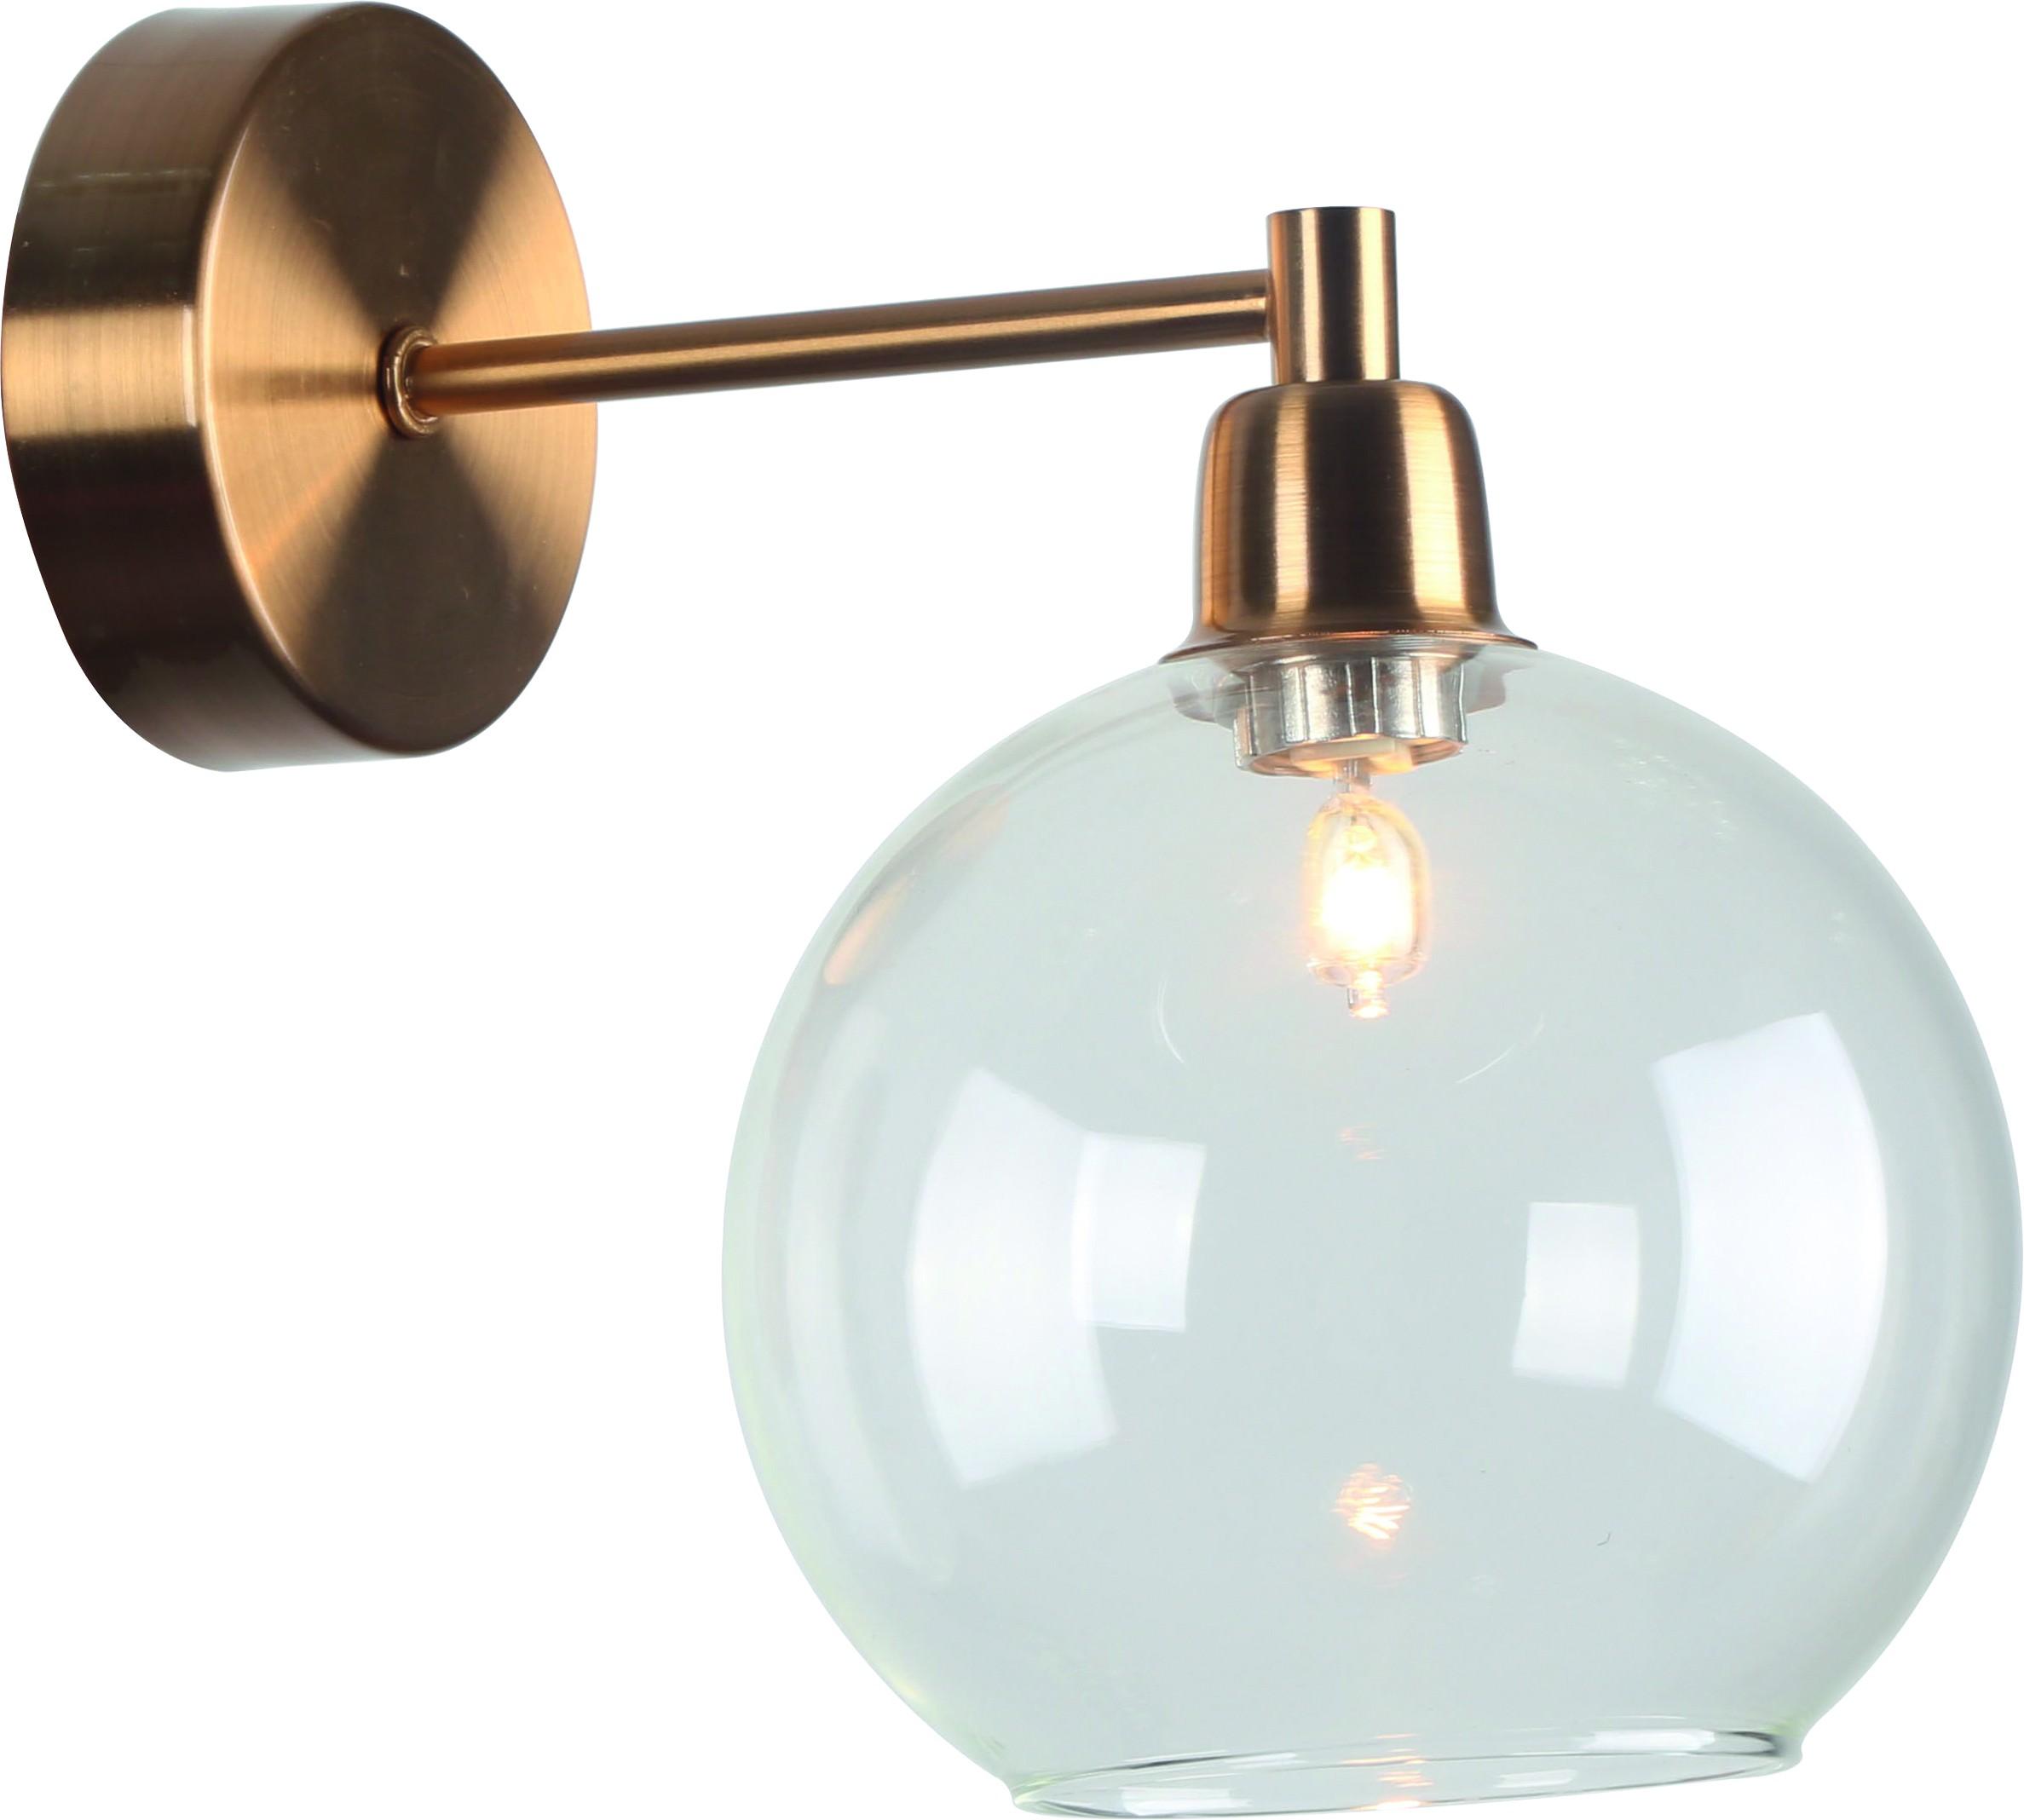 Бра Arte lamp A8564ap-1rb arte lamp бра arte lamp a5012ap 1rb